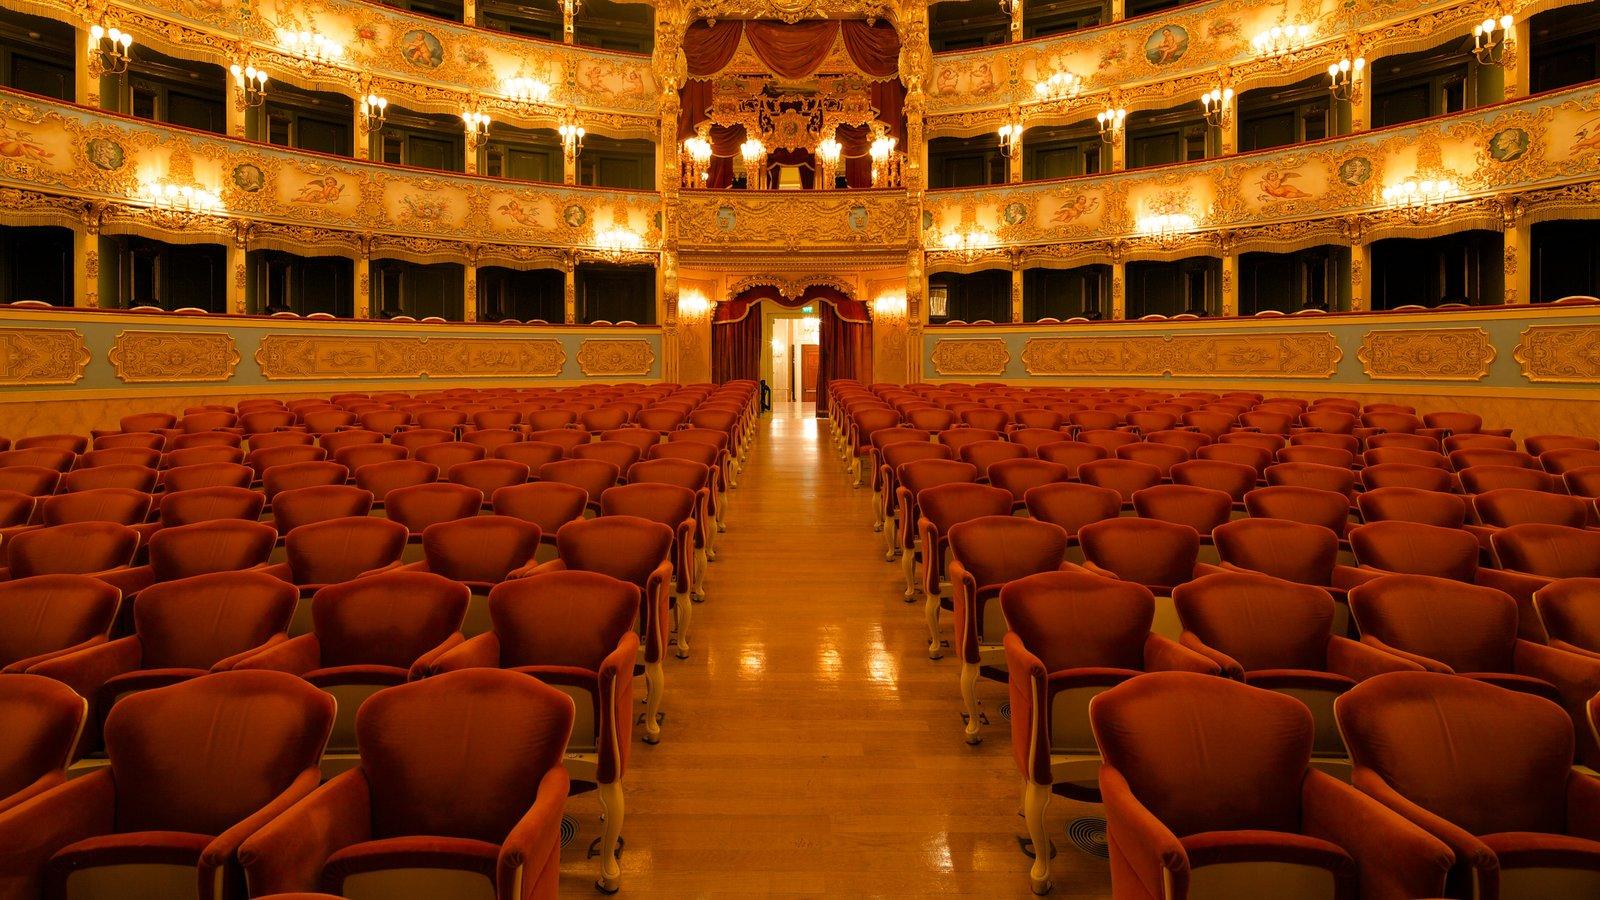 La Fenice Opera House which includes theater scenes, interior views and heritage architecture